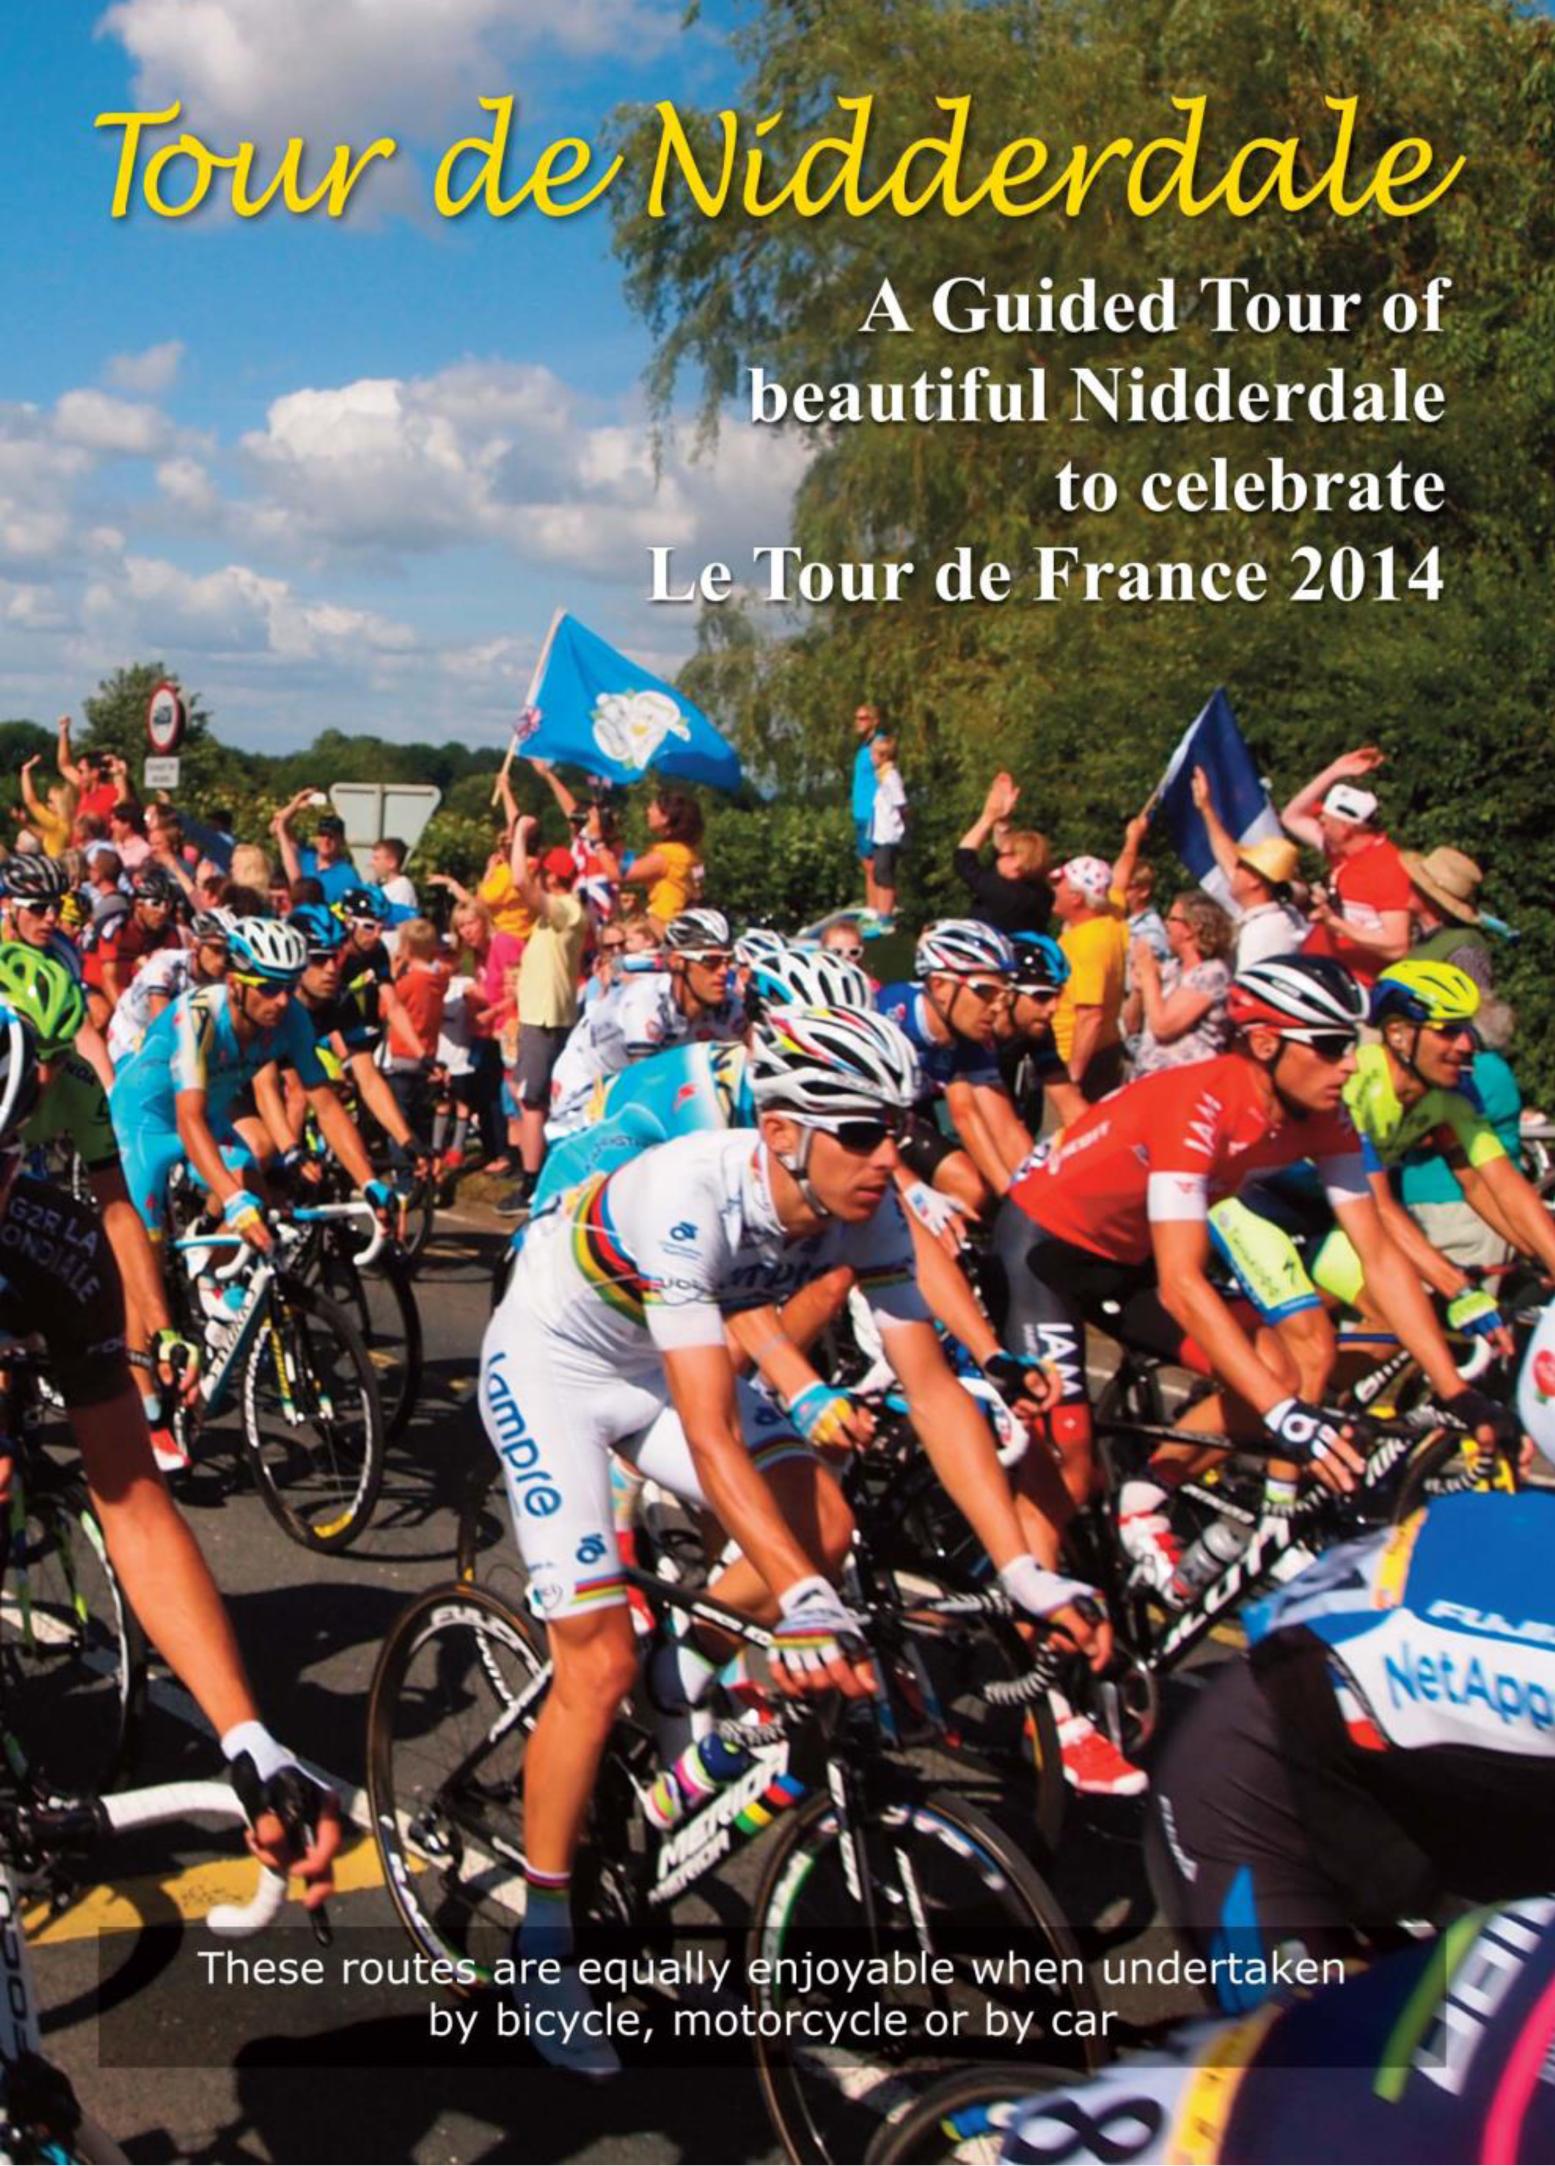 Tour_de_Nidderdale_1